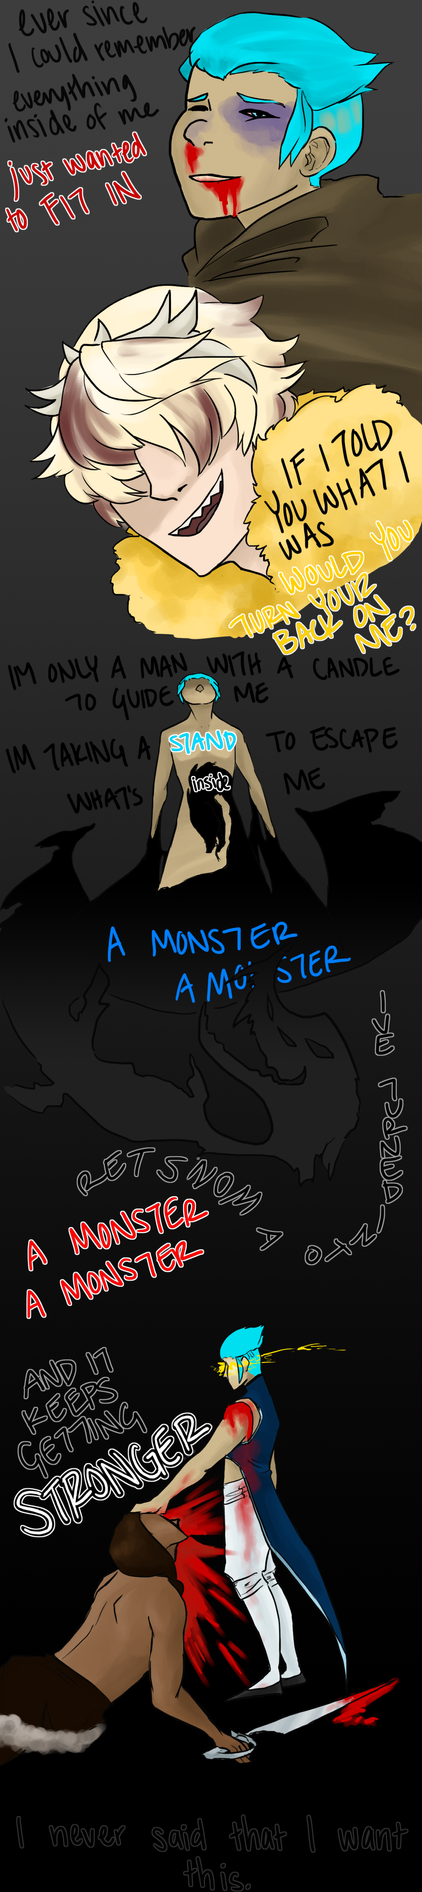 A monster by bishouen-satan